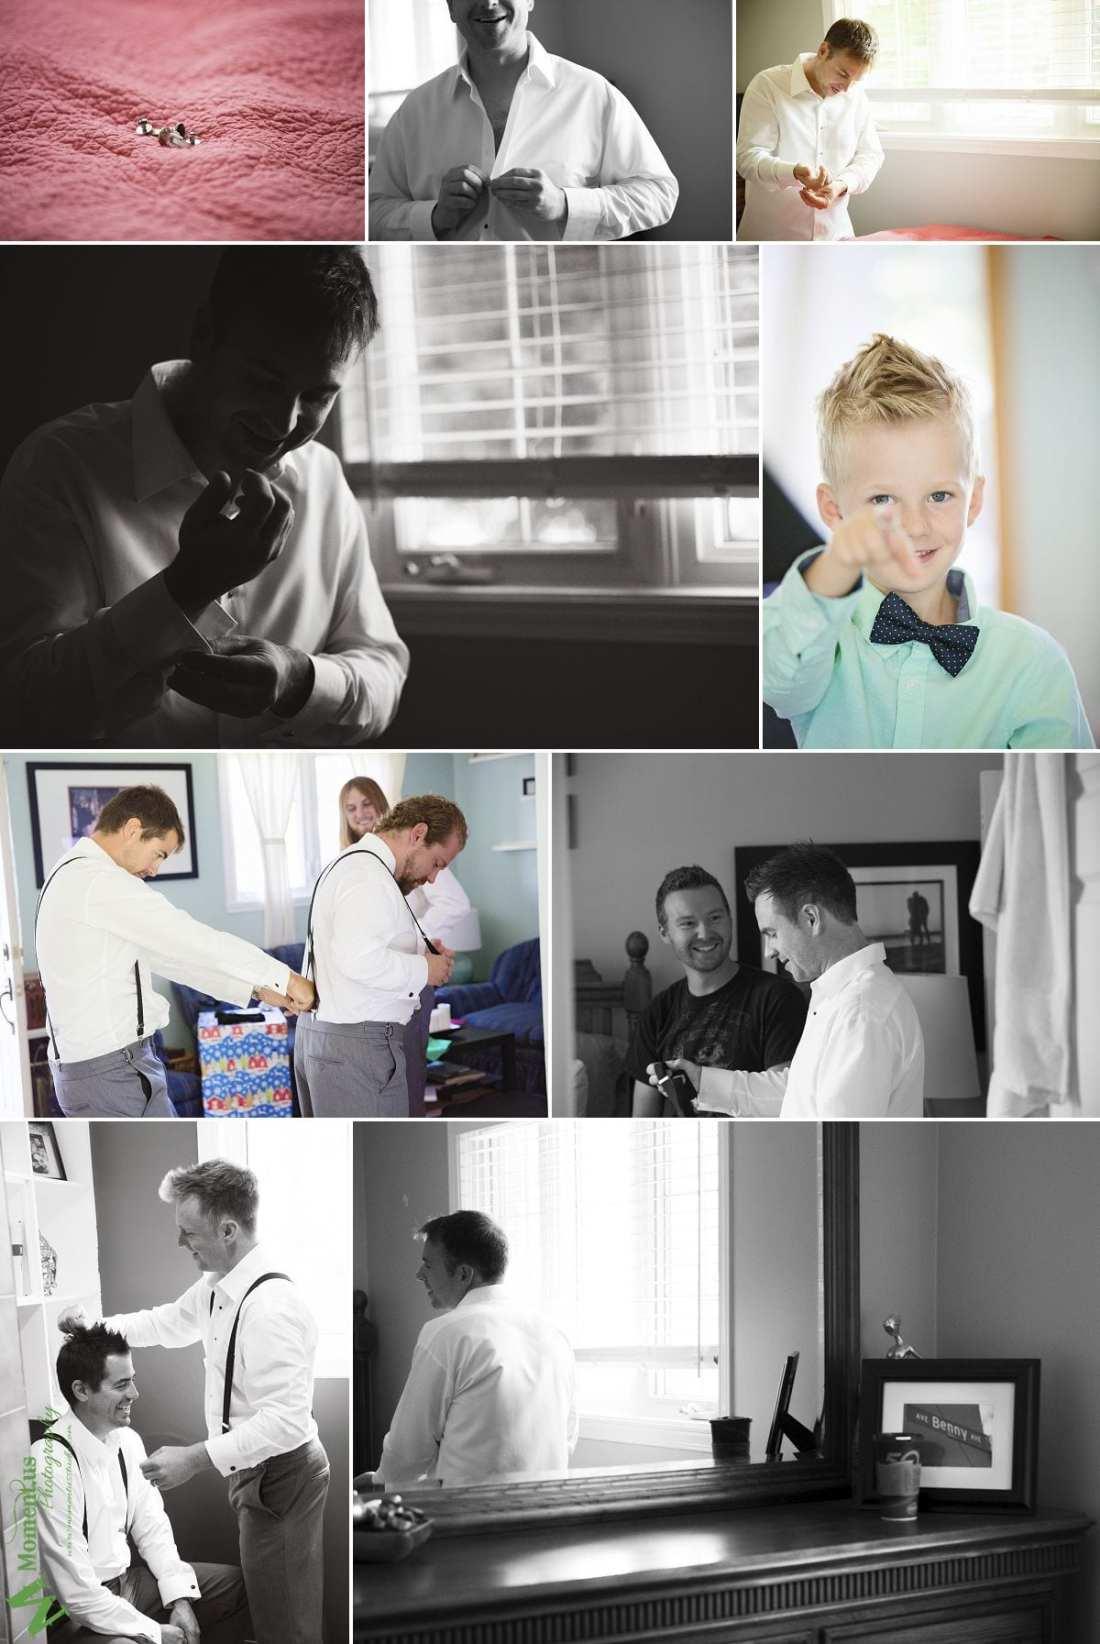 Elegant Cornwall wedding - groom buttoning shirt